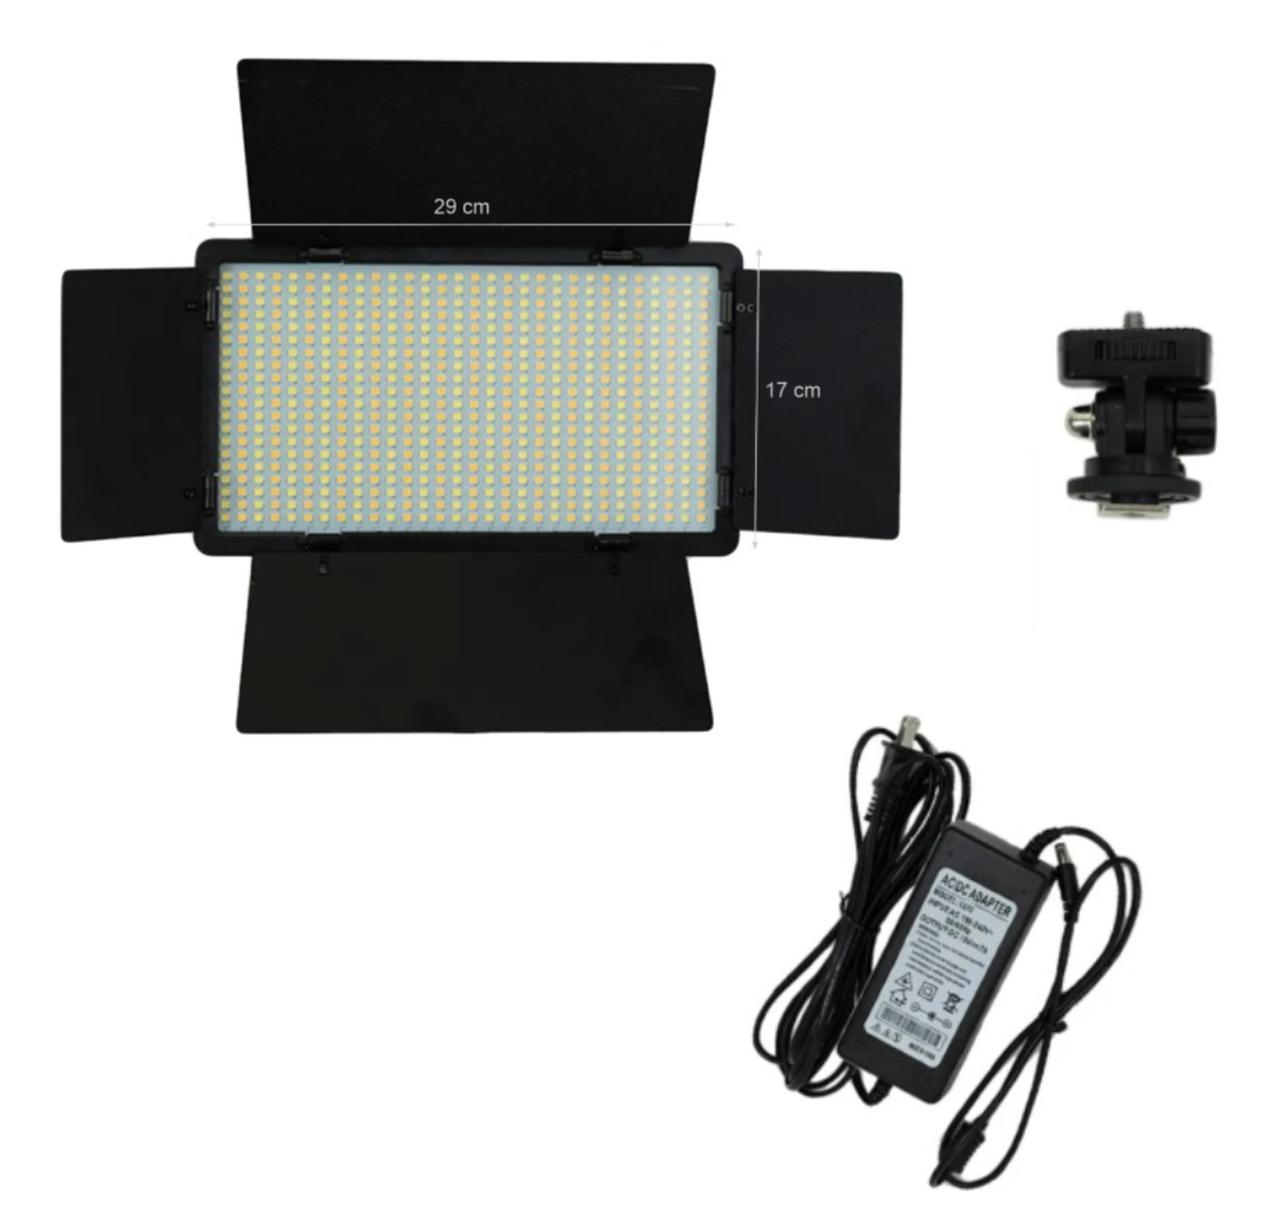 Iluminador de Led Bicolor Somita Mod LED-1120/U-800 65w